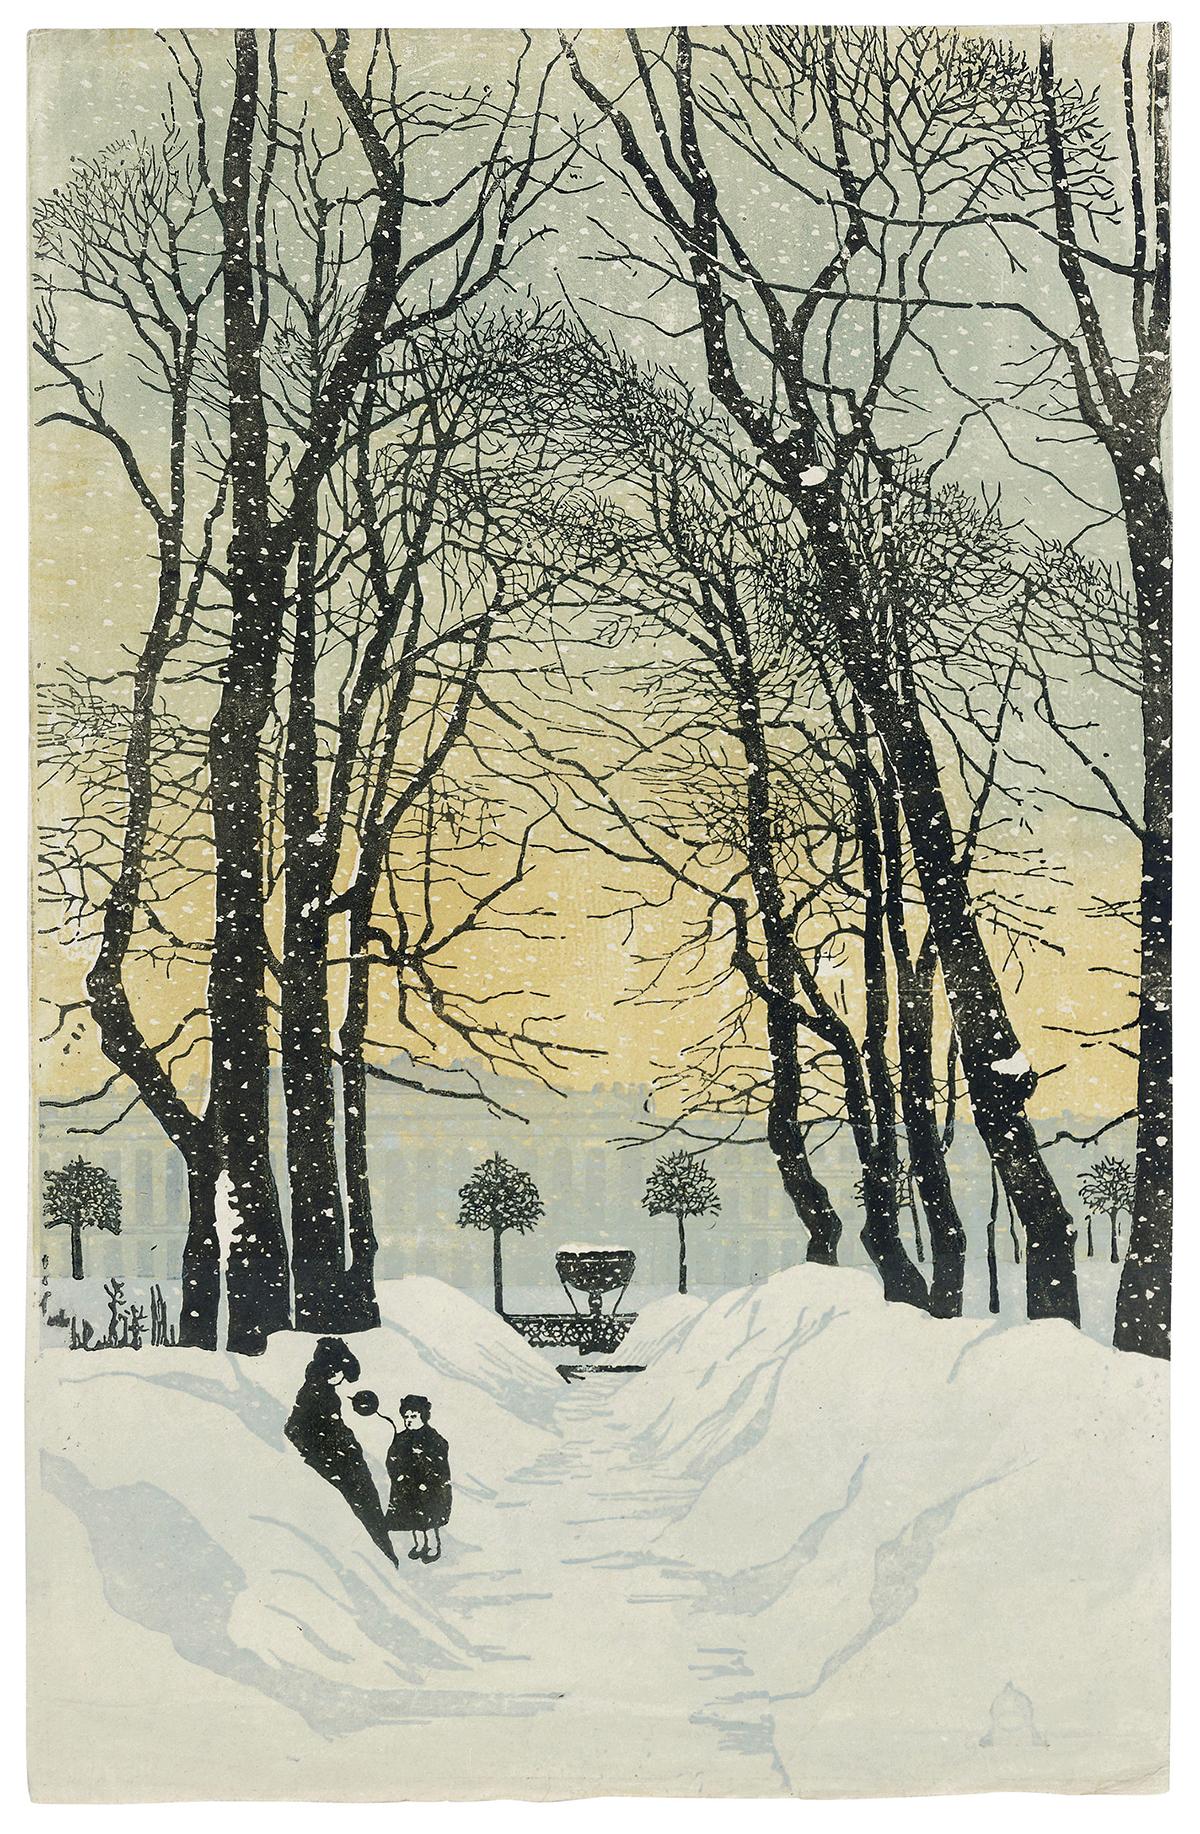 The Summer Garden in Winter 1902